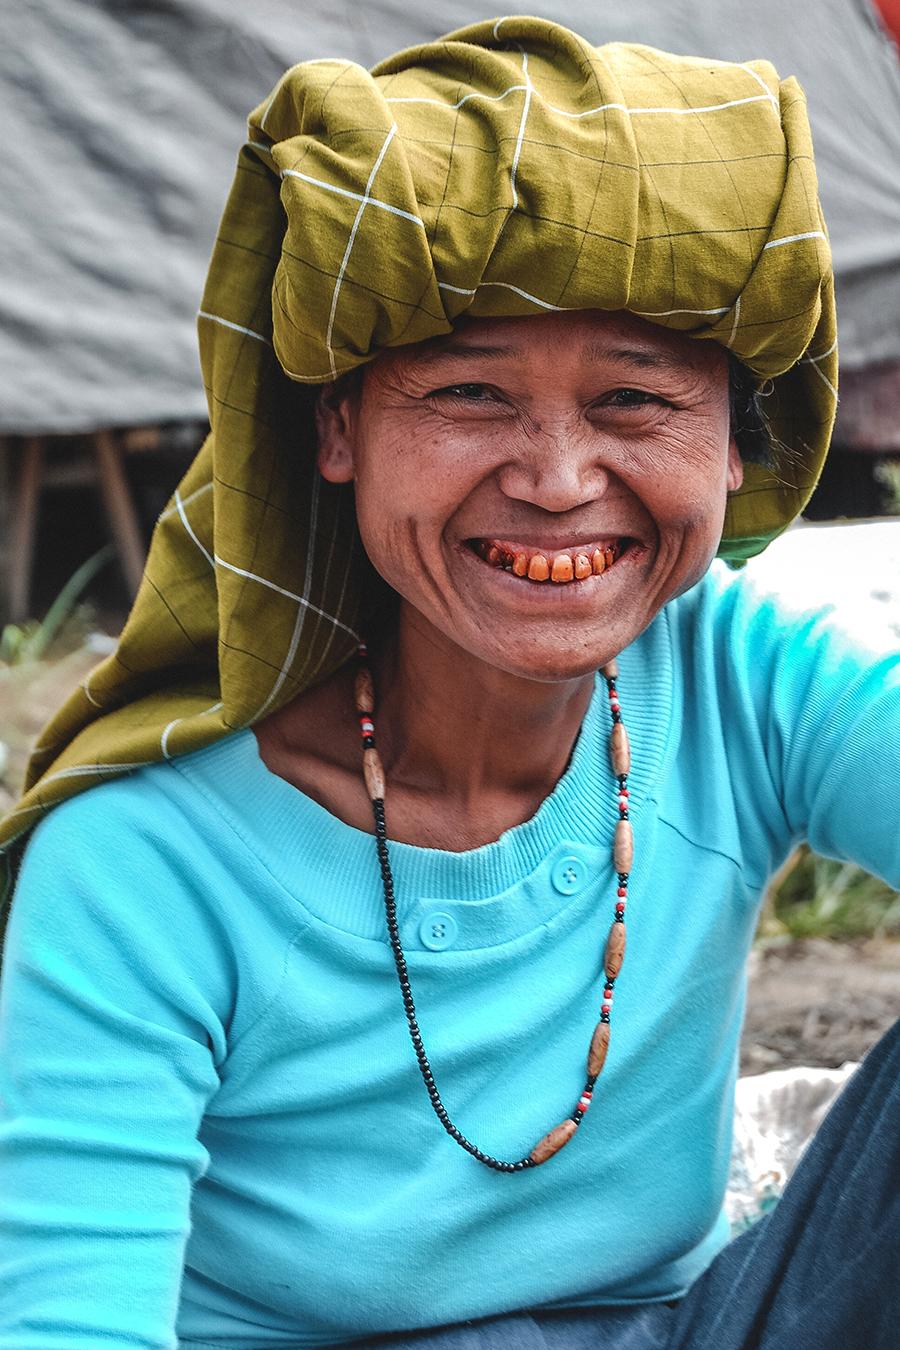 Market vendor in Toraja, Sulawesi.